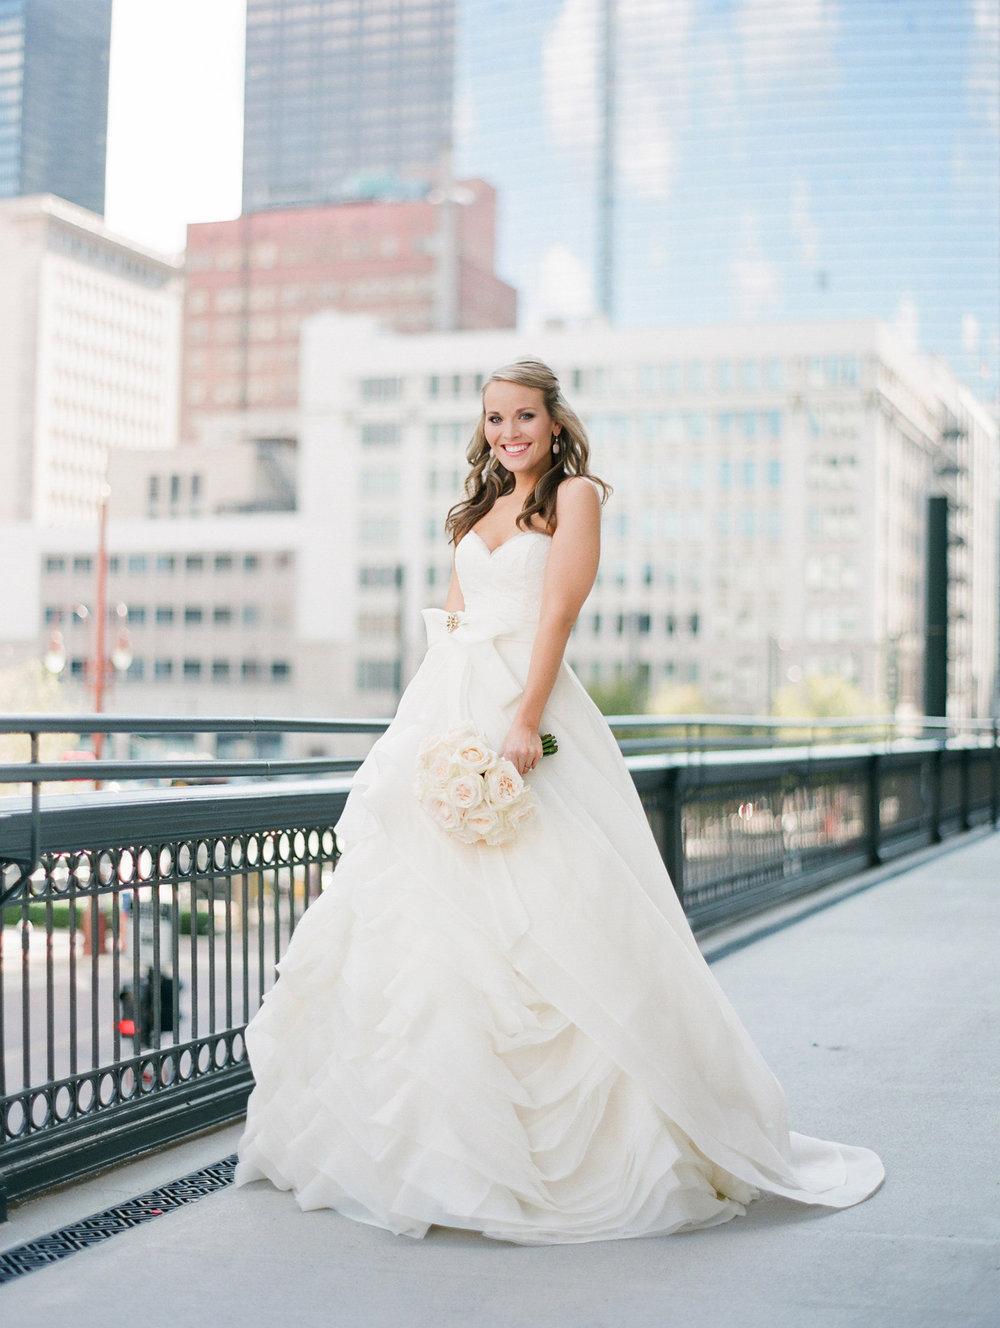 0049_0039_Houston-Film-Bridal-Photographer.jpg